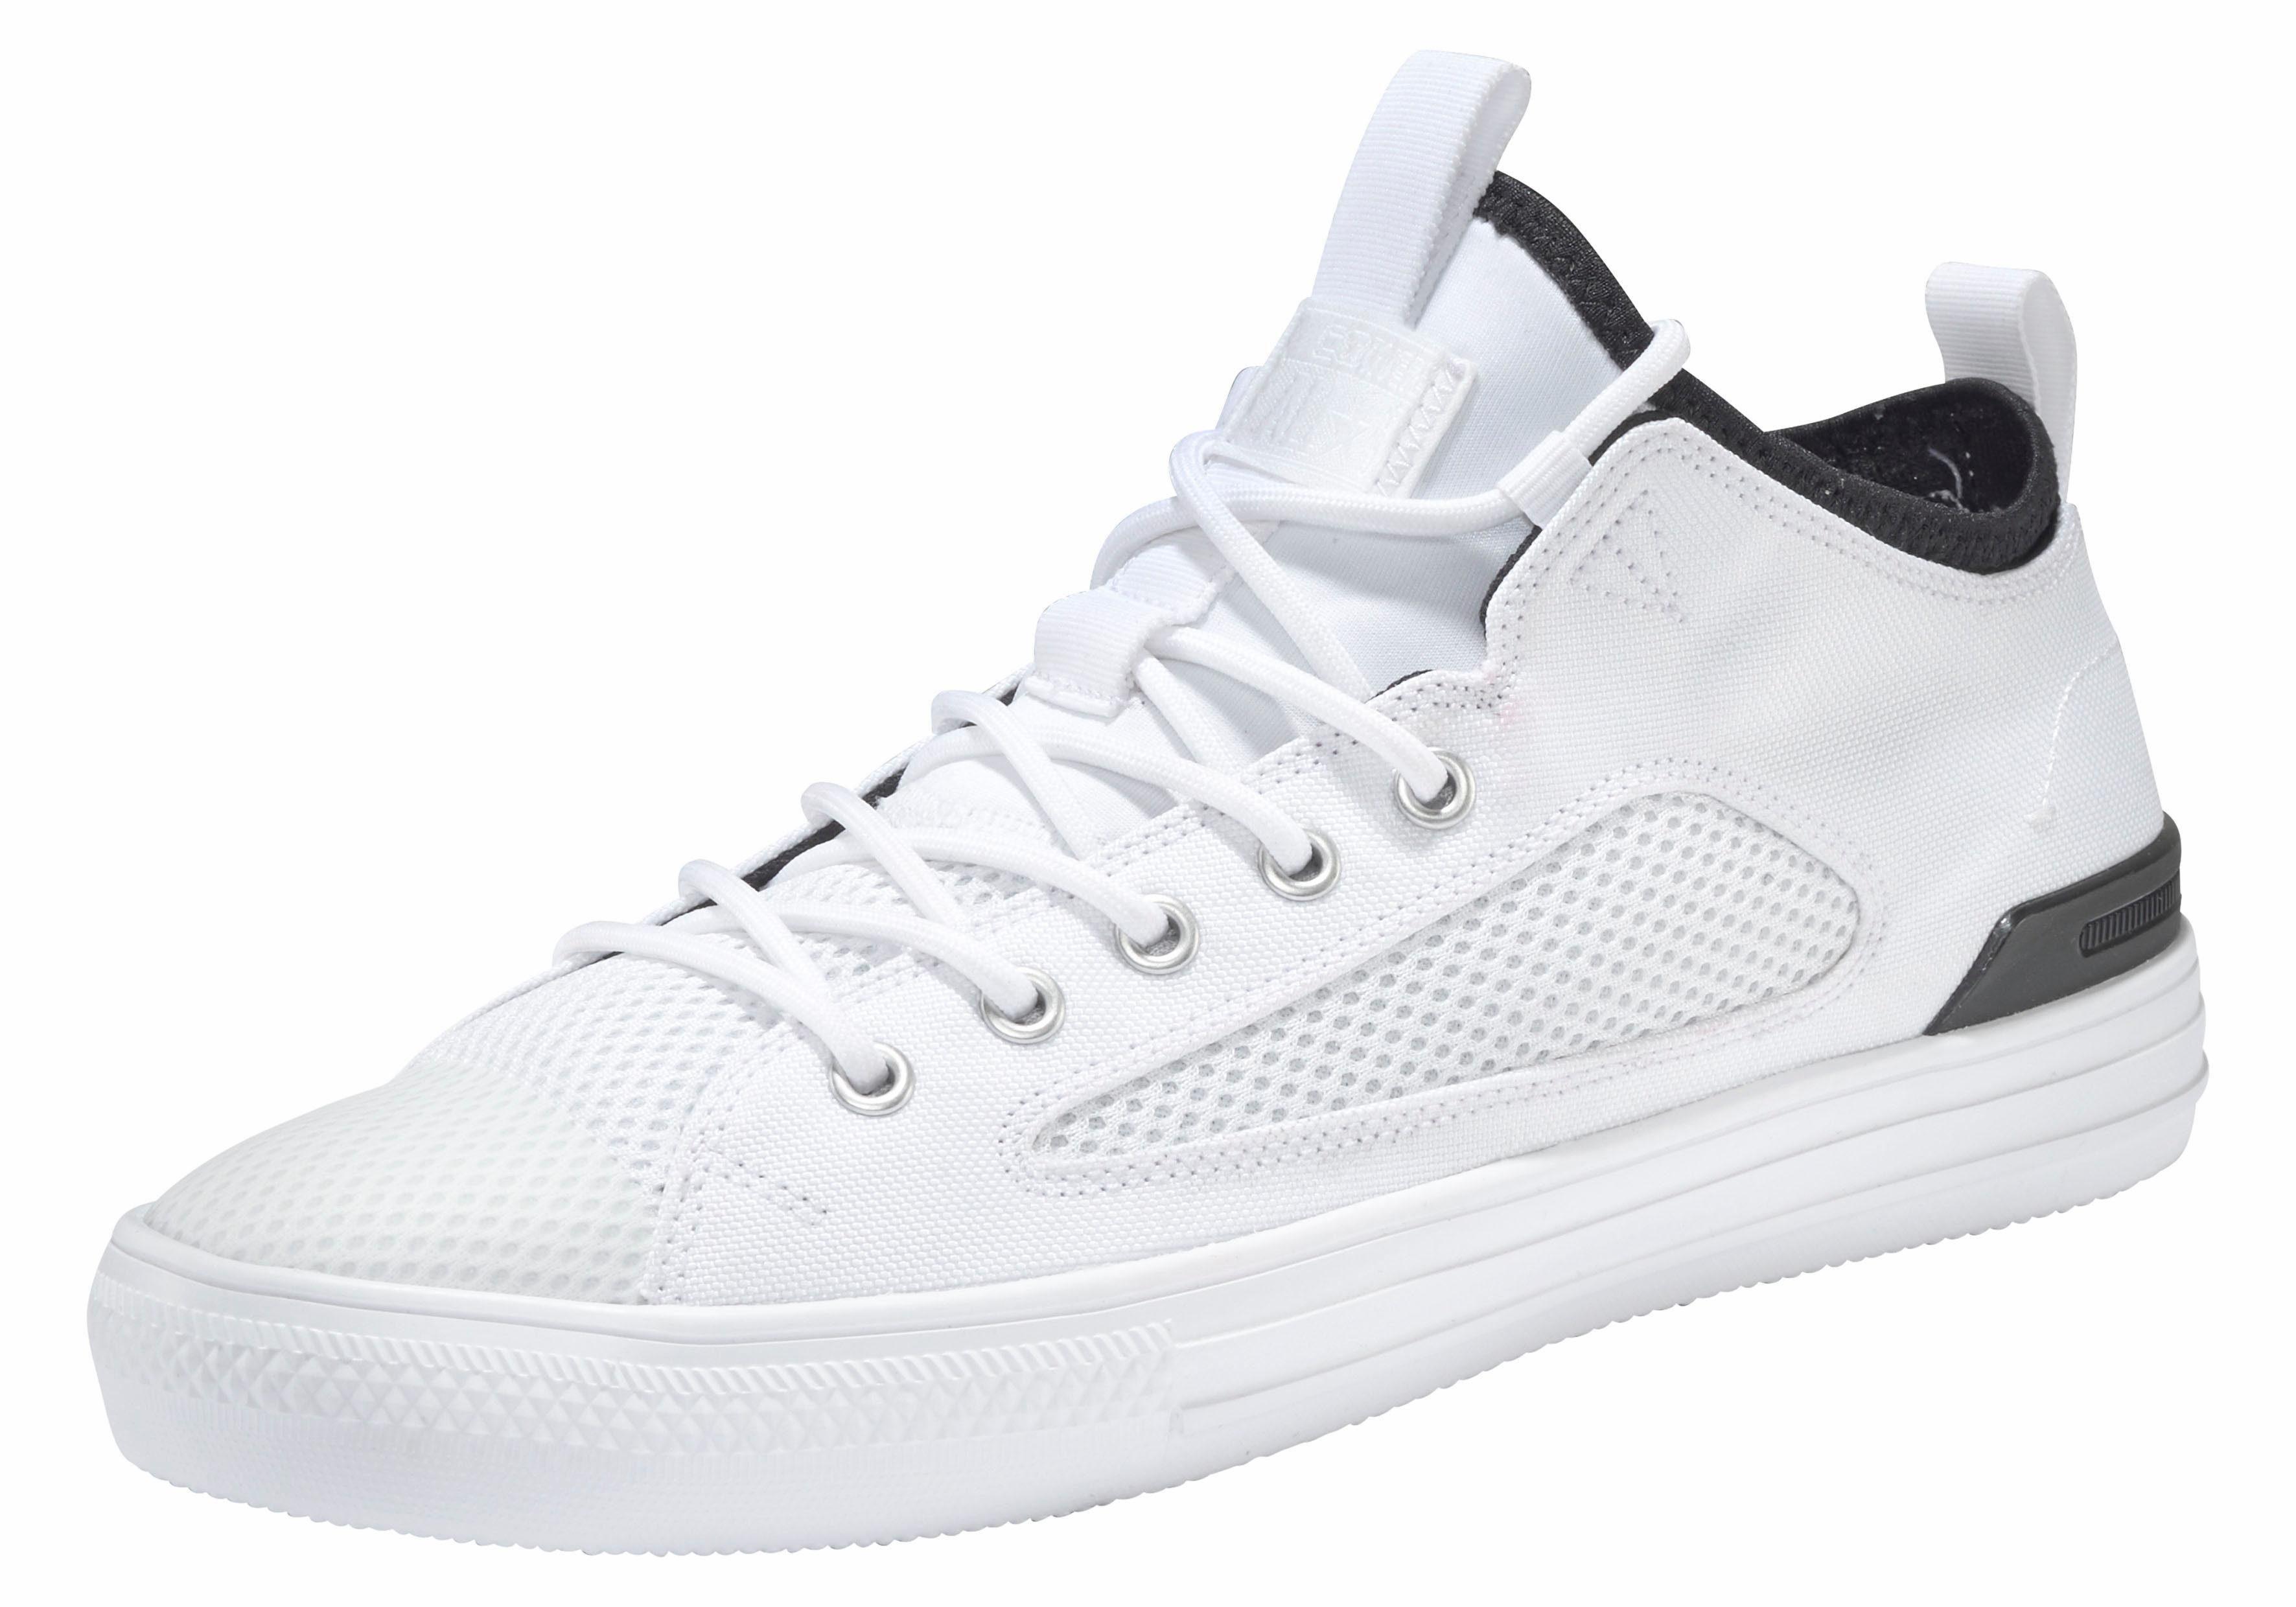 Converse Chuck Taylor Low Sneaker Weiß All Star OX Herren